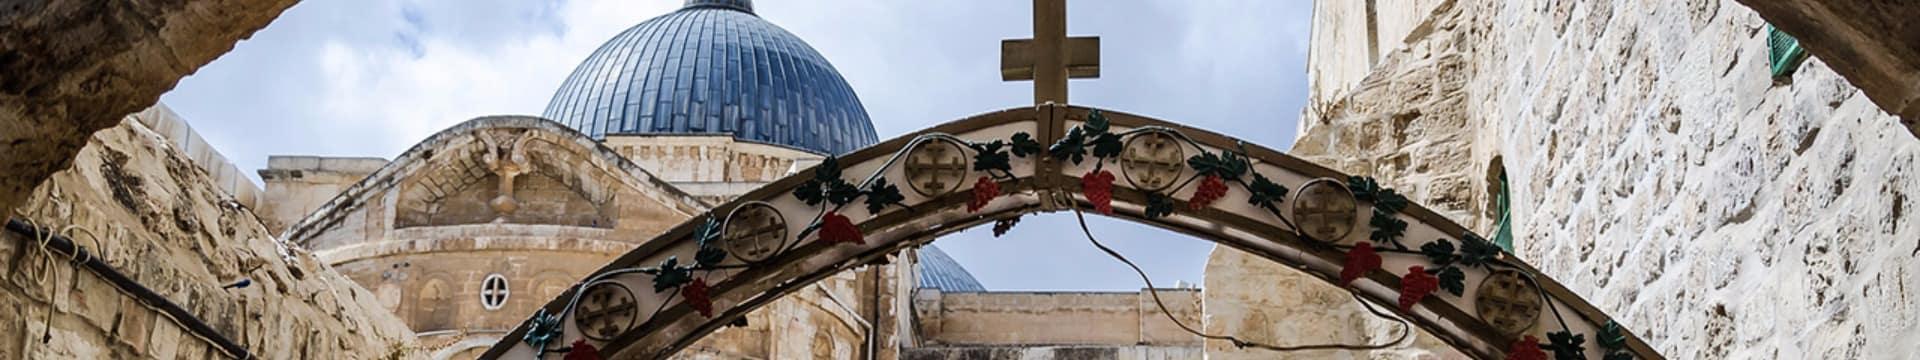 Via Dolorosa - Jerusalém, Israel.